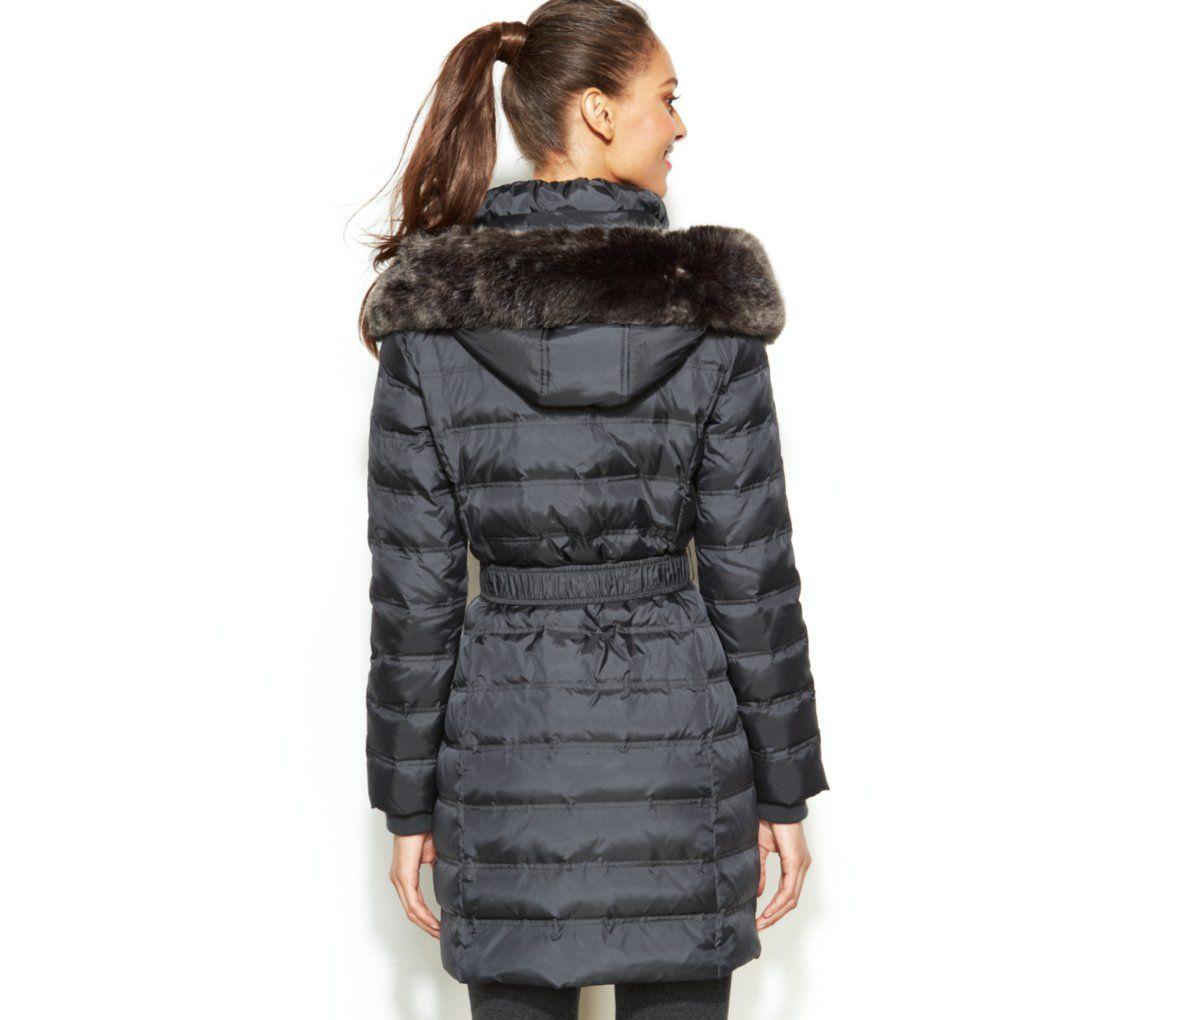 Dkny Hooded Faux Fur Trim Belted Down Puffer Coat Coats Women Macy S Hooded Faux Down Puffer Coat Puffer Coat [ 1020 x 1200 Pixel ]